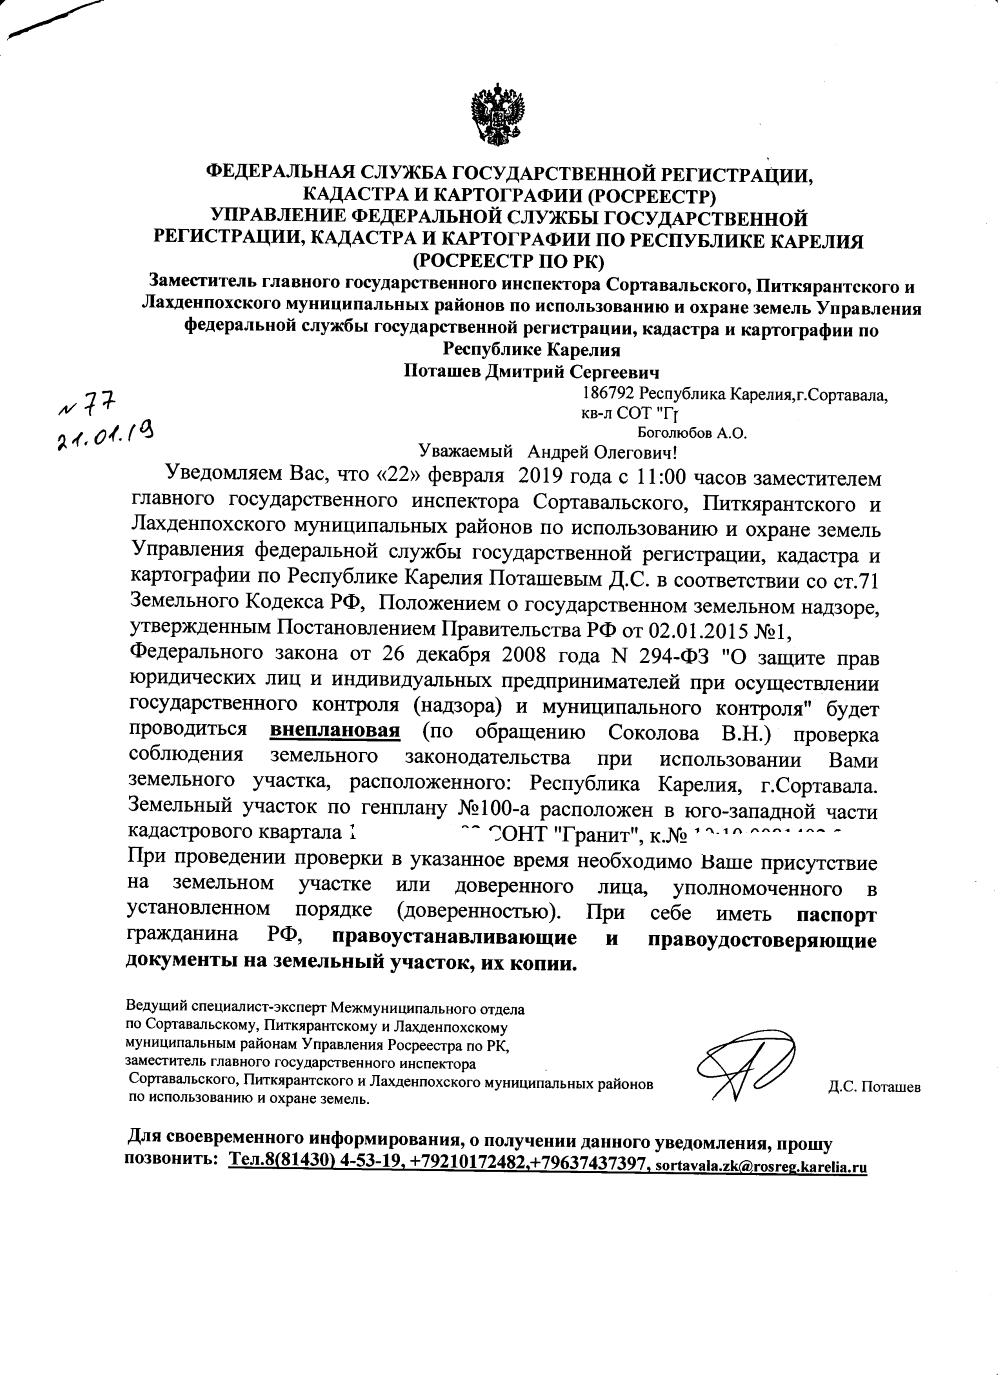 https://sontgranit.ru/forum/img/sokol/20190121-письмо-поташева2.png